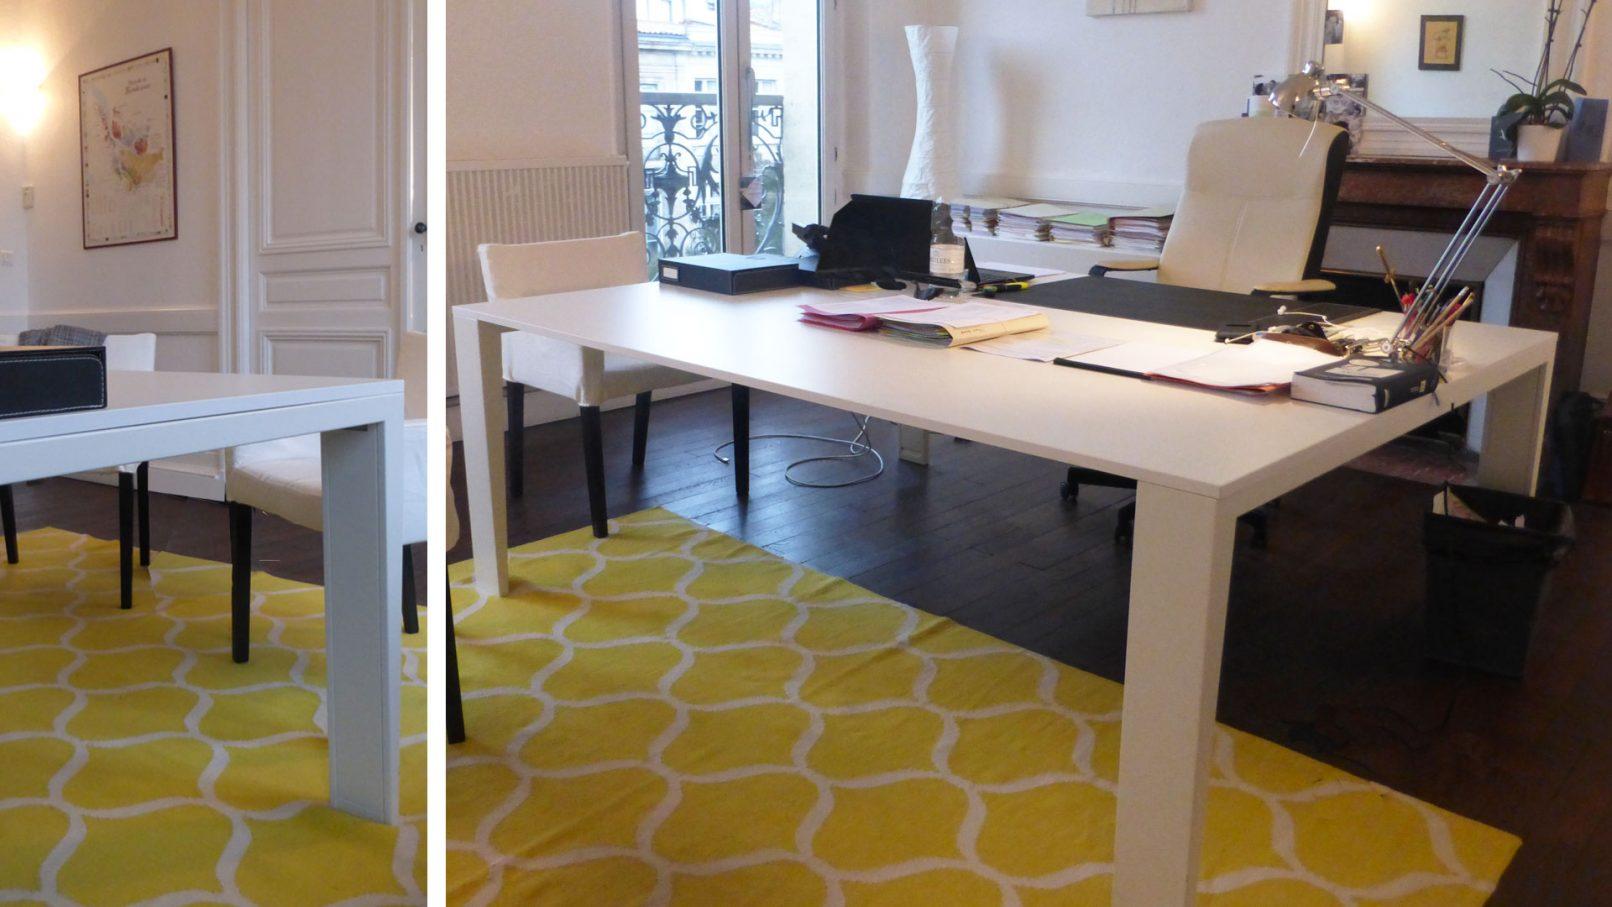 aloy avocats bordeaux recto verso. Black Bedroom Furniture Sets. Home Design Ideas